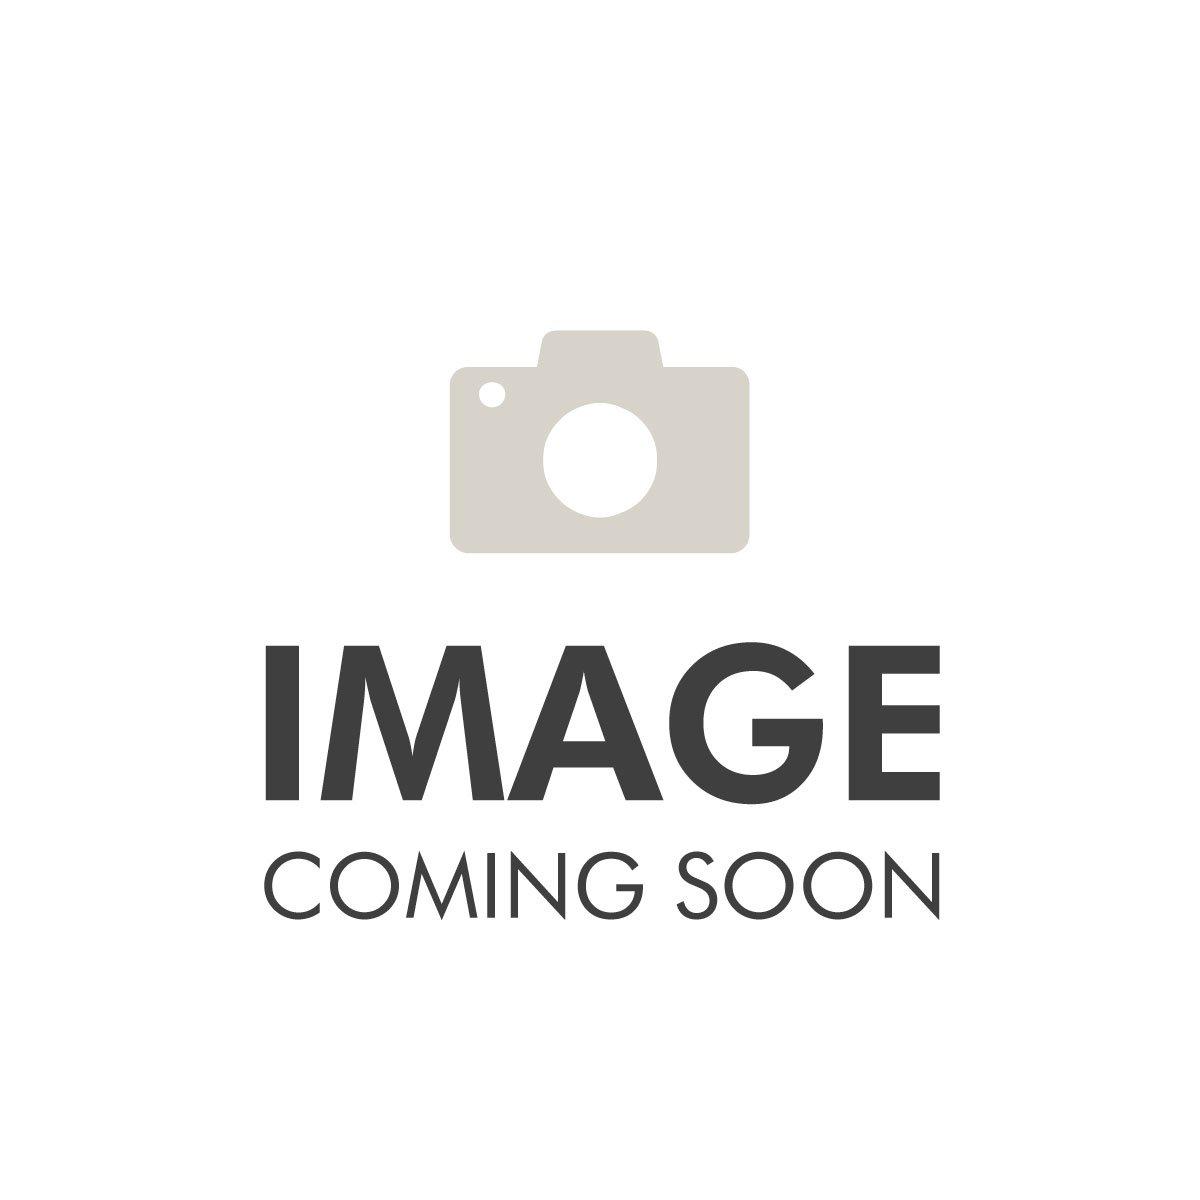 L'Oreal Loreal Pro Classics Shampoo Concentrated X10 1500ml